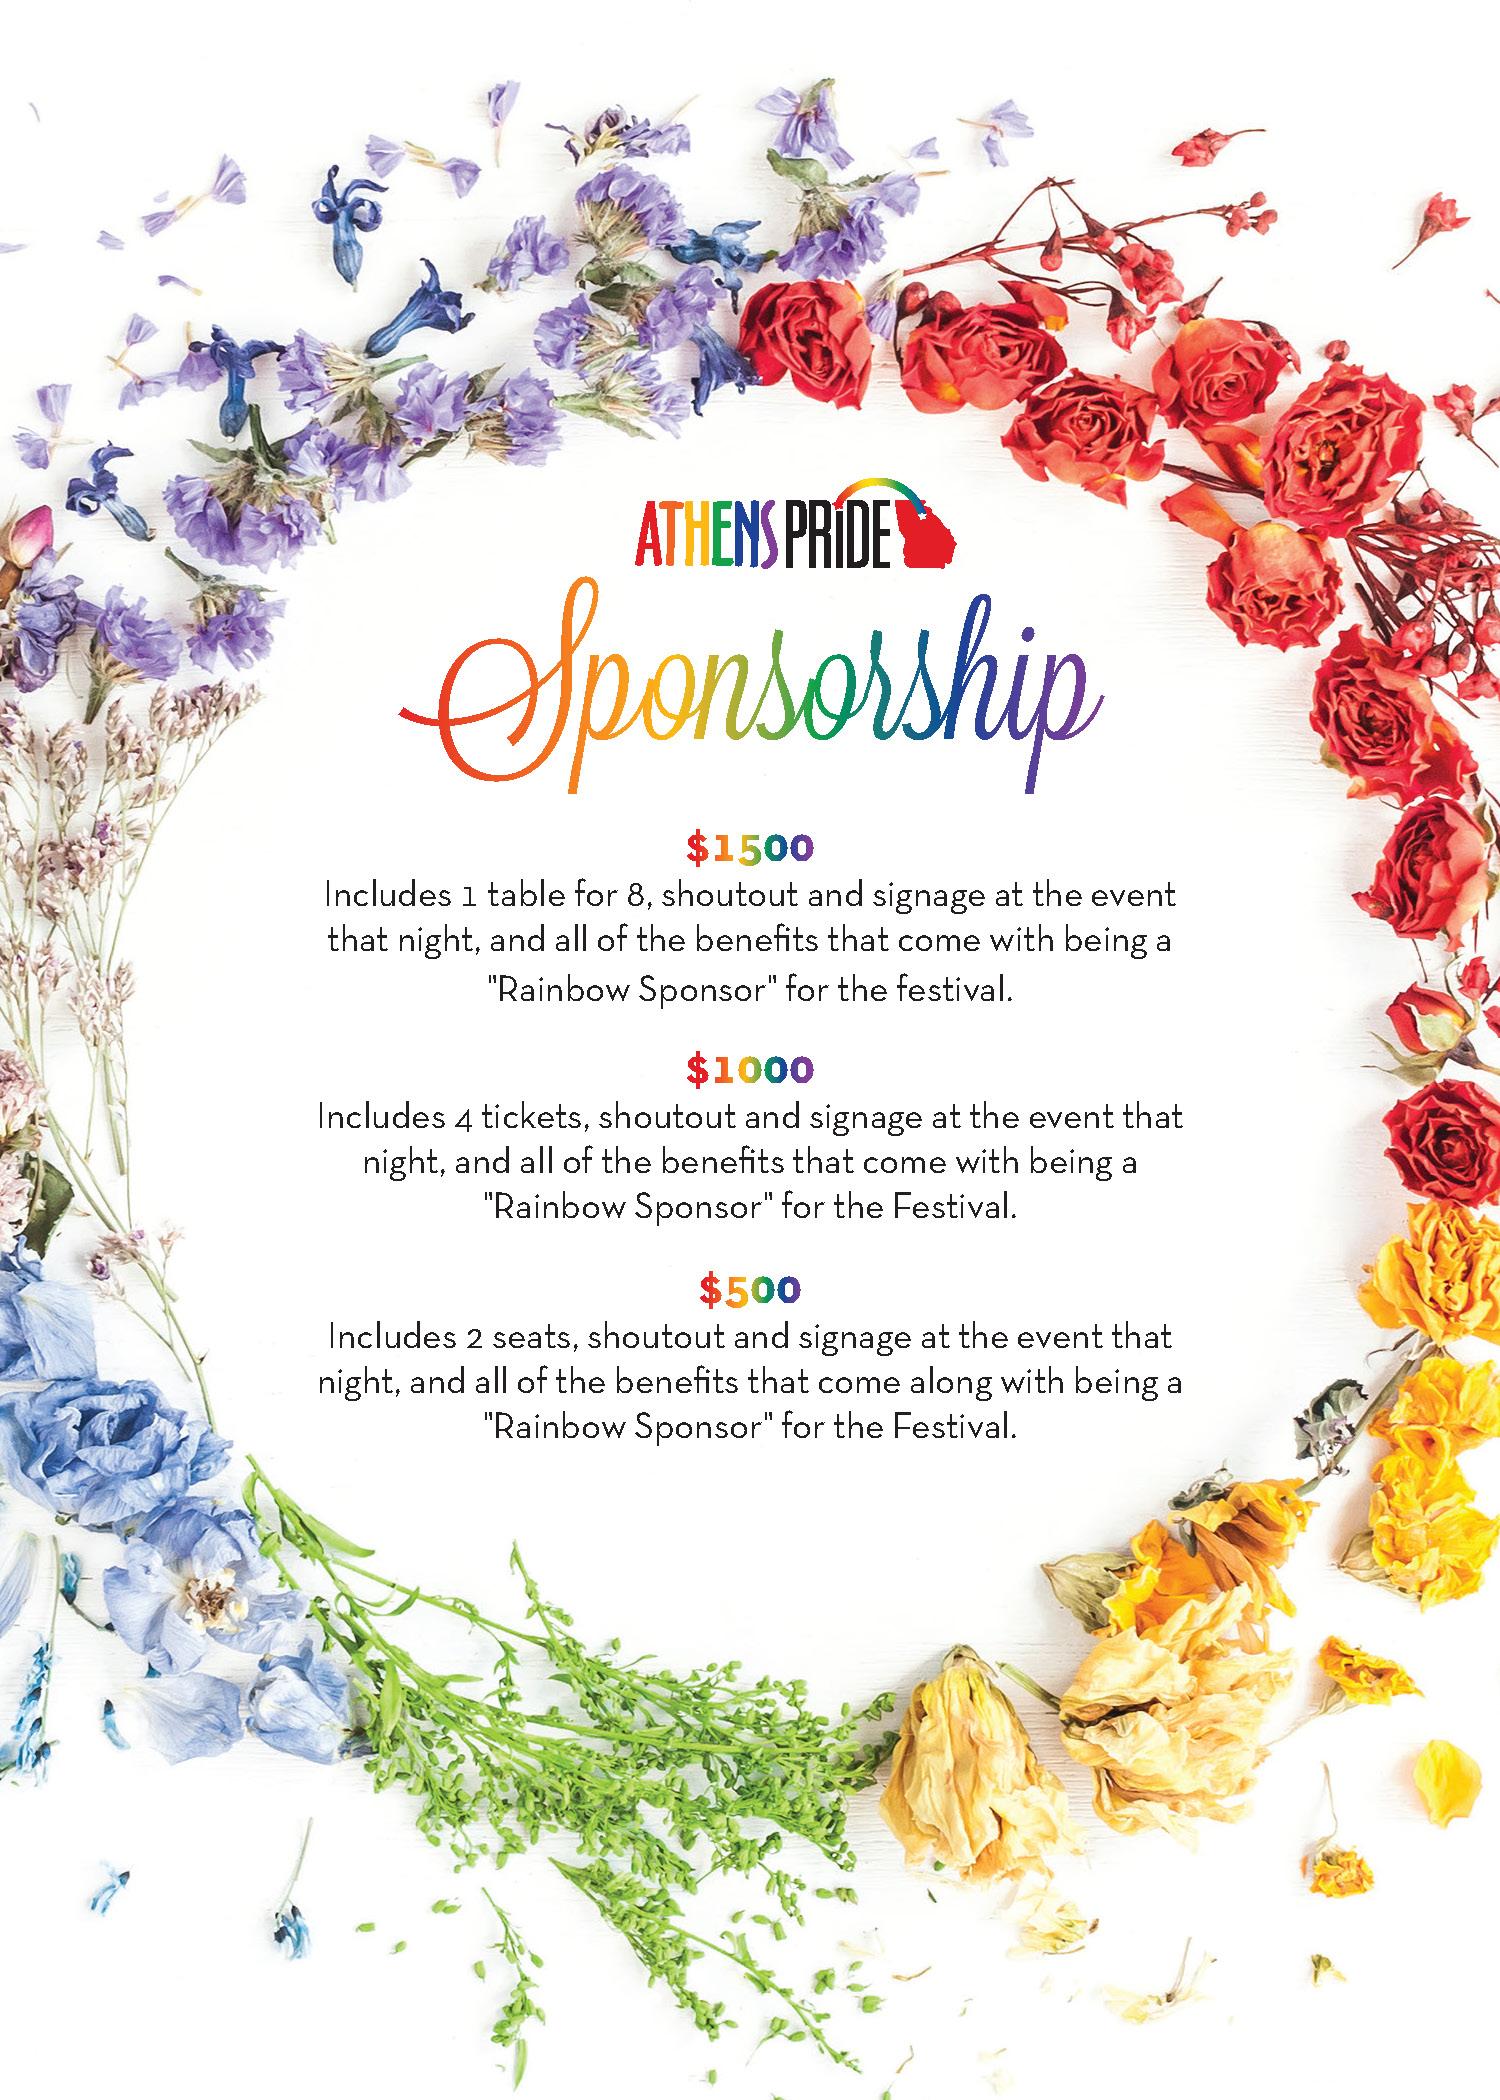 summersoiree_athenspride_sponsorship.jpg